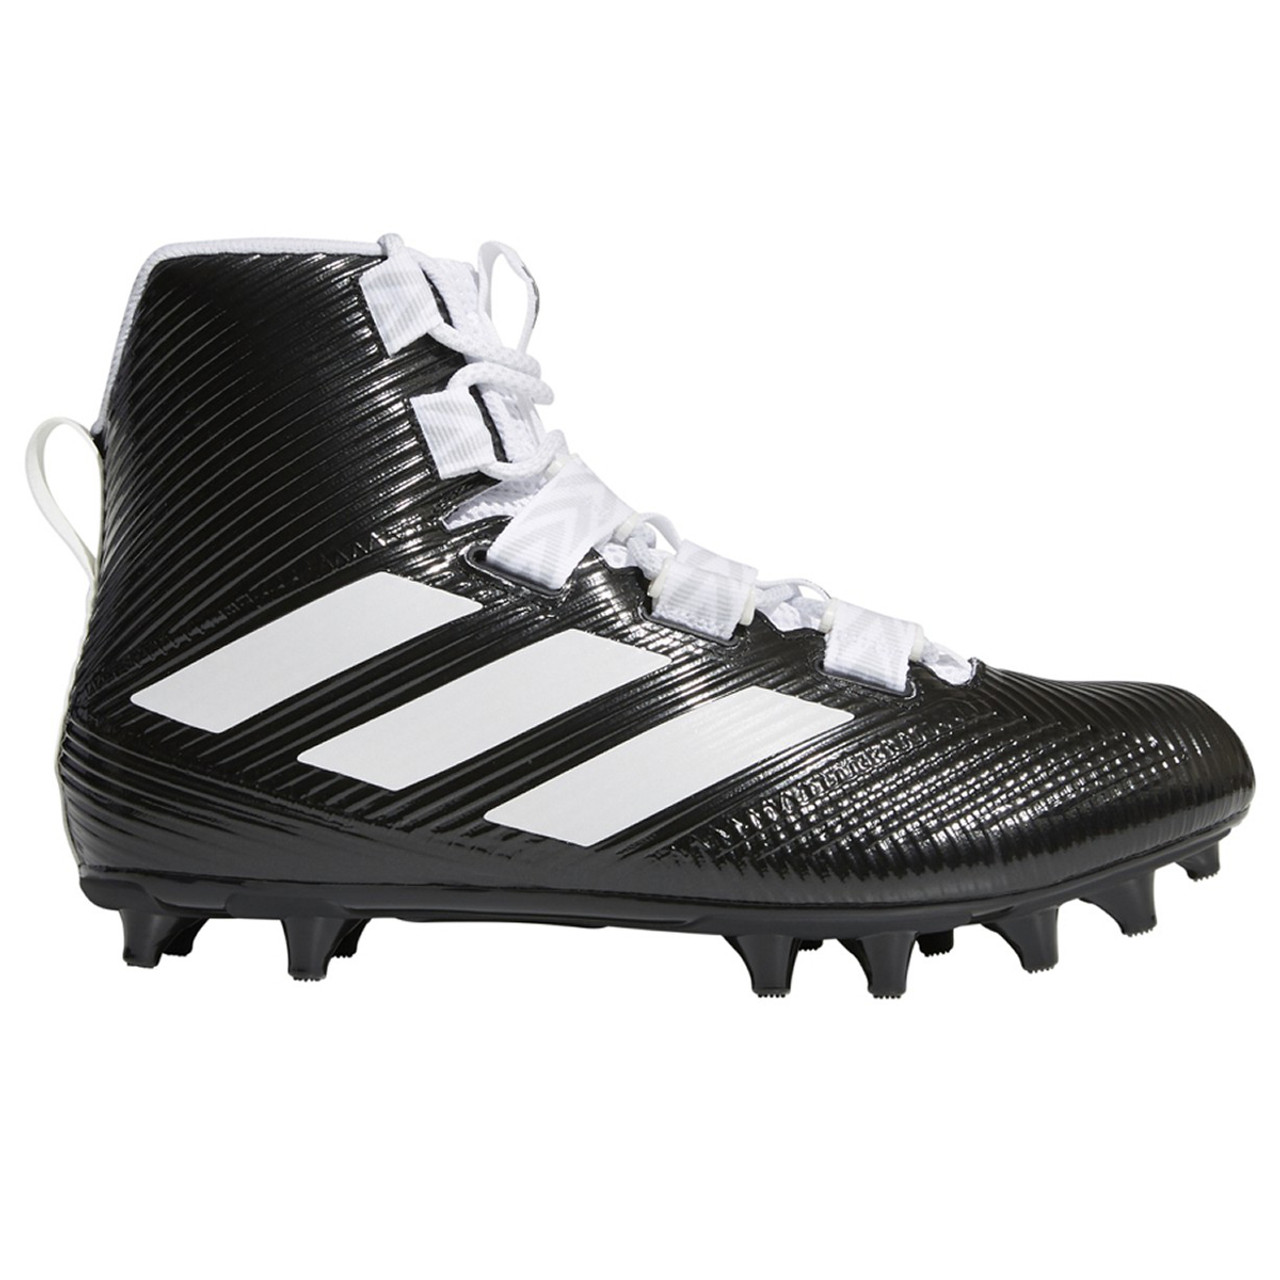 Adidas Freak Carbon High Men's Football